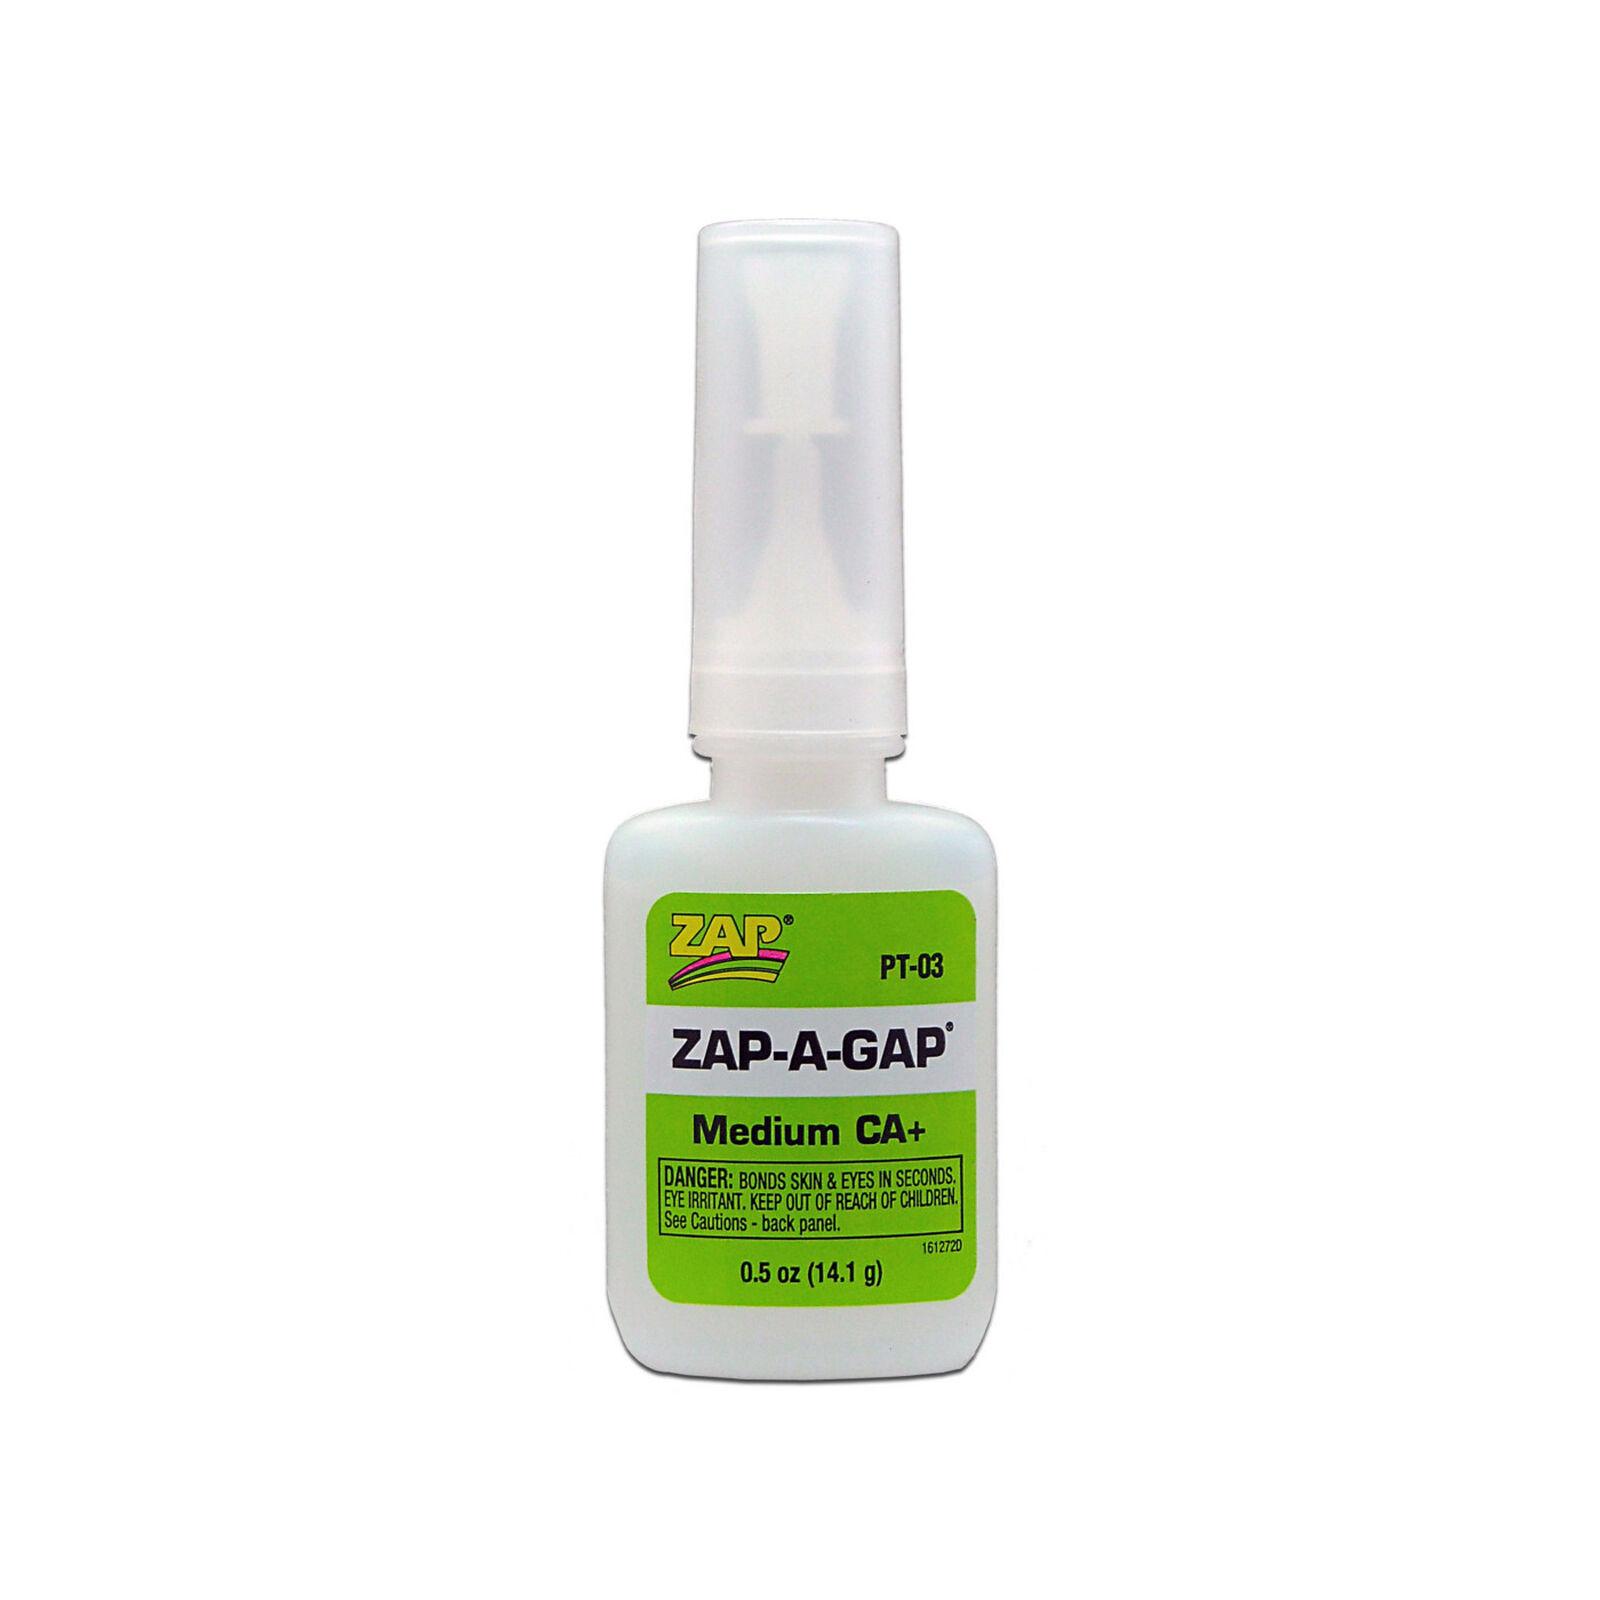 Zap-A-Gap Medium CA+ Glue, 1/2 oz